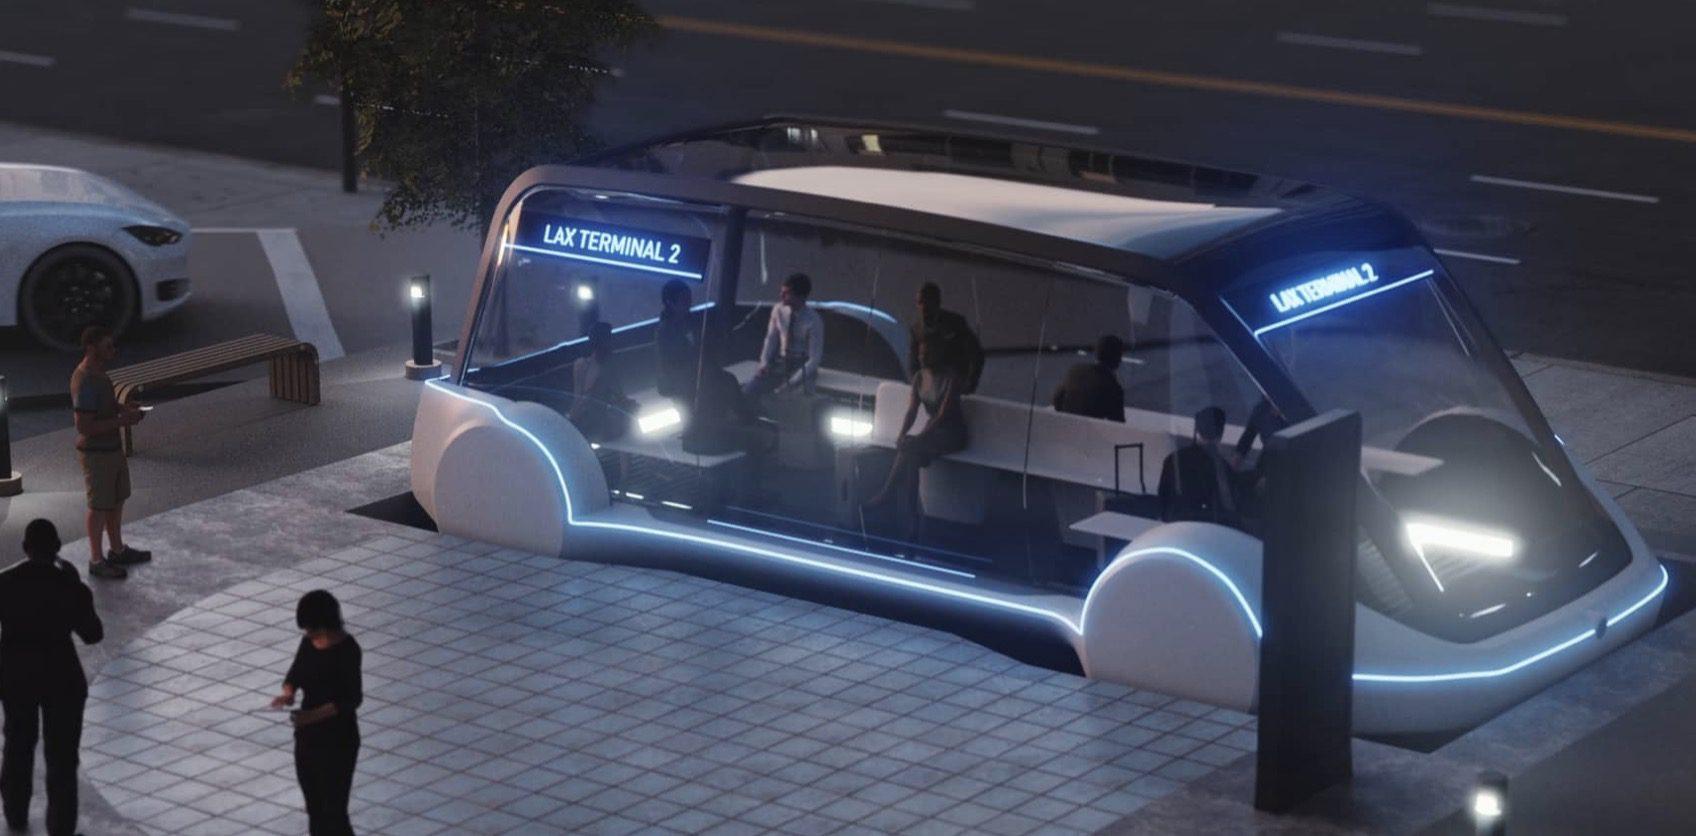 Elon Musk's Boring Company to unveil 'fully road legal autonomous transport cars'